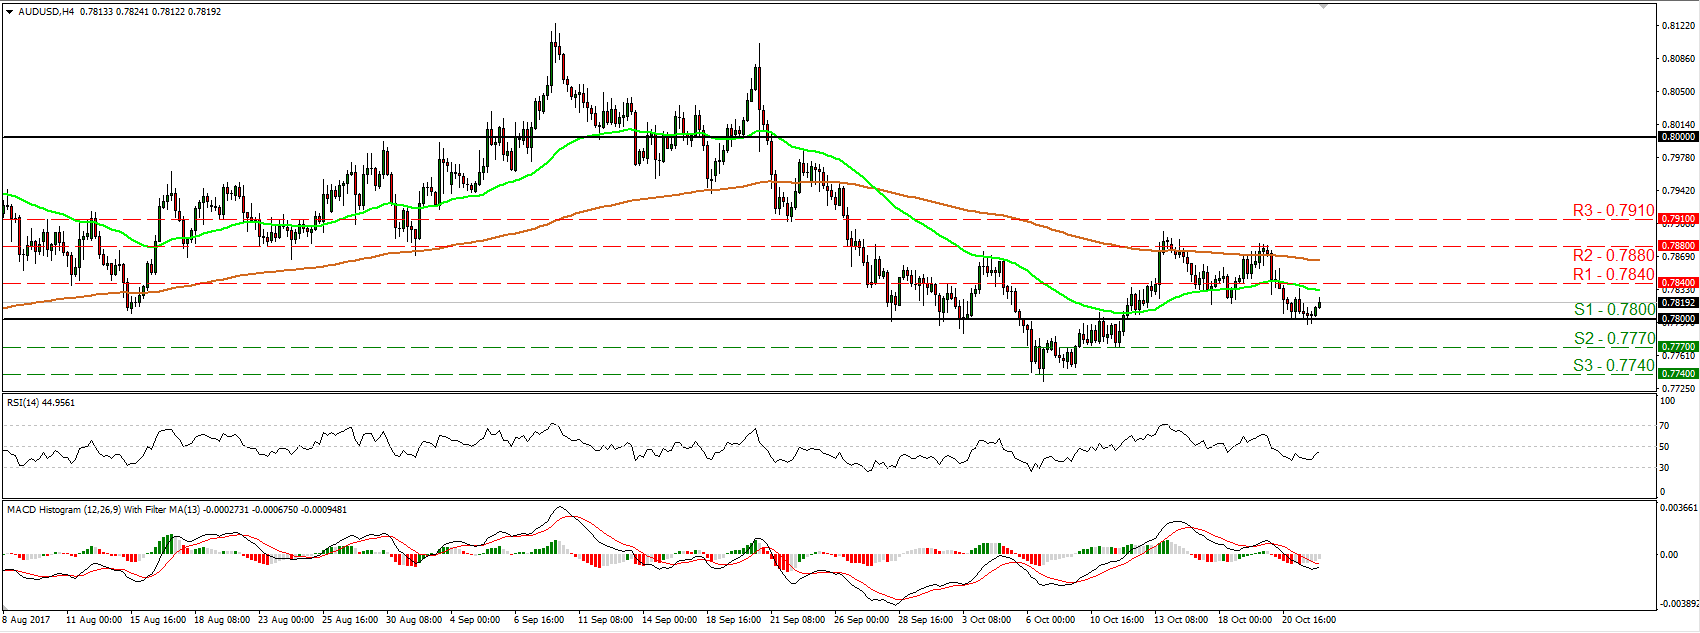 AUD/USD 24 Oct 2017 | Econ Alerts